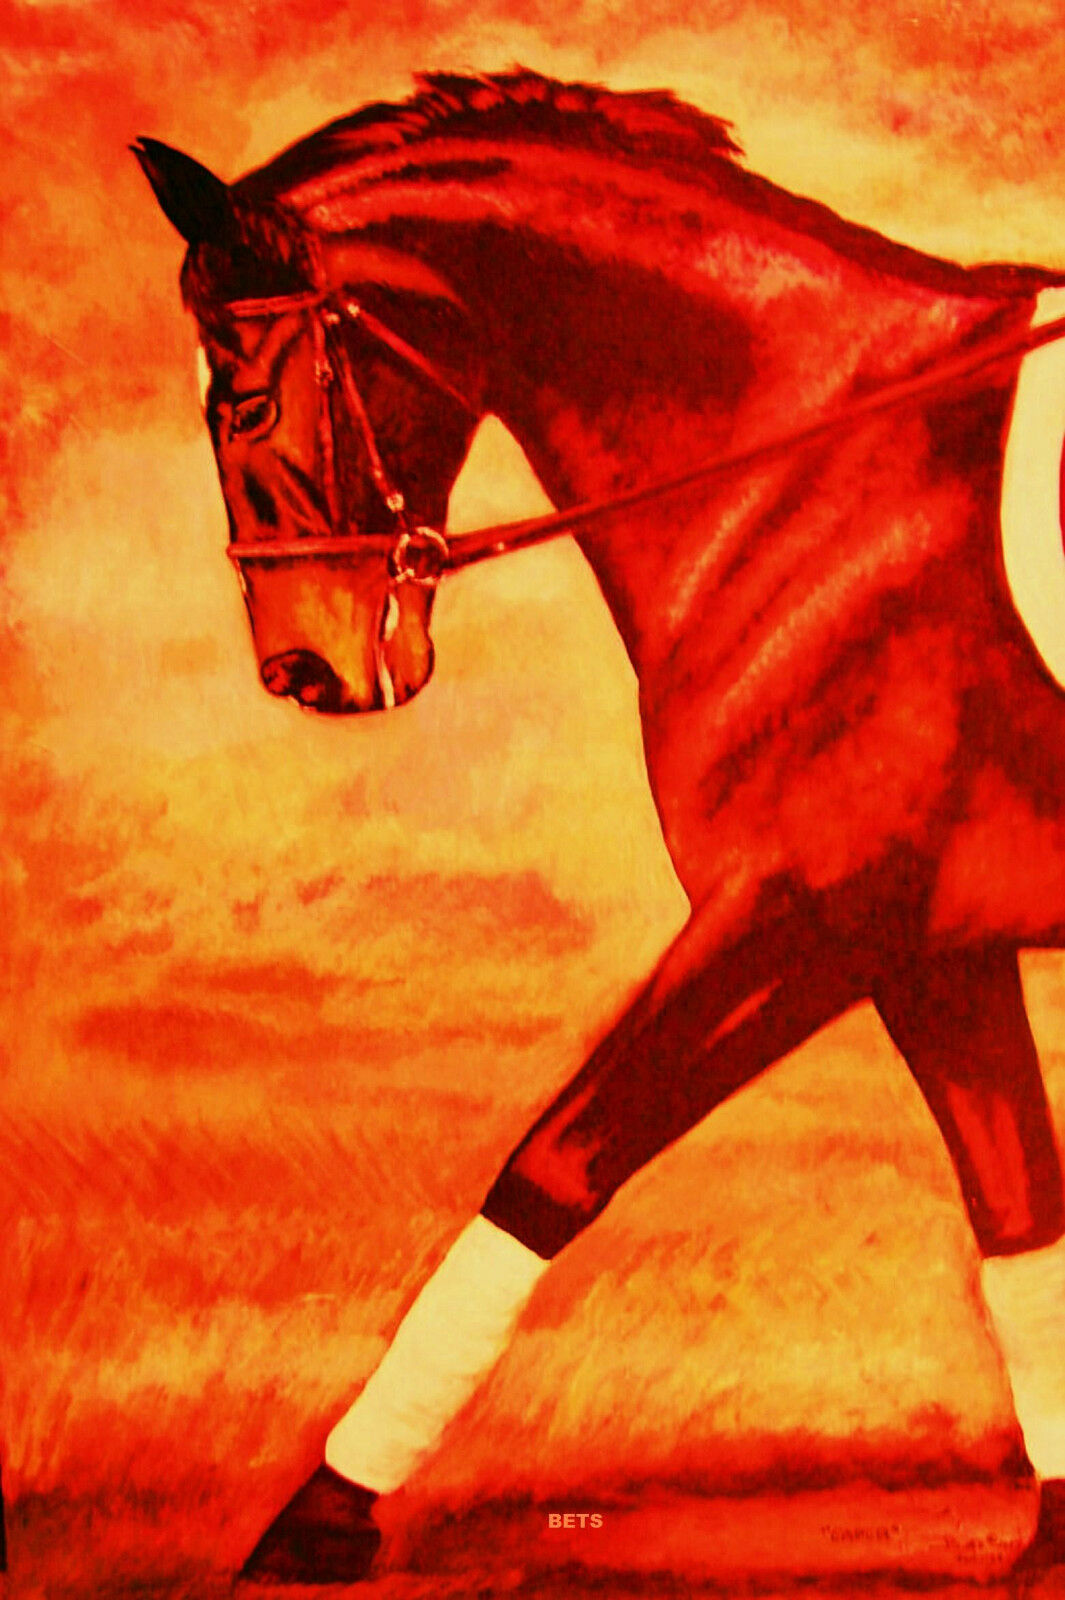 HORSE PRINT Giclee DRESSAGE  Art CAPER by artist BETS 7 COLORS print size 14 X 19  enjoy 50% off